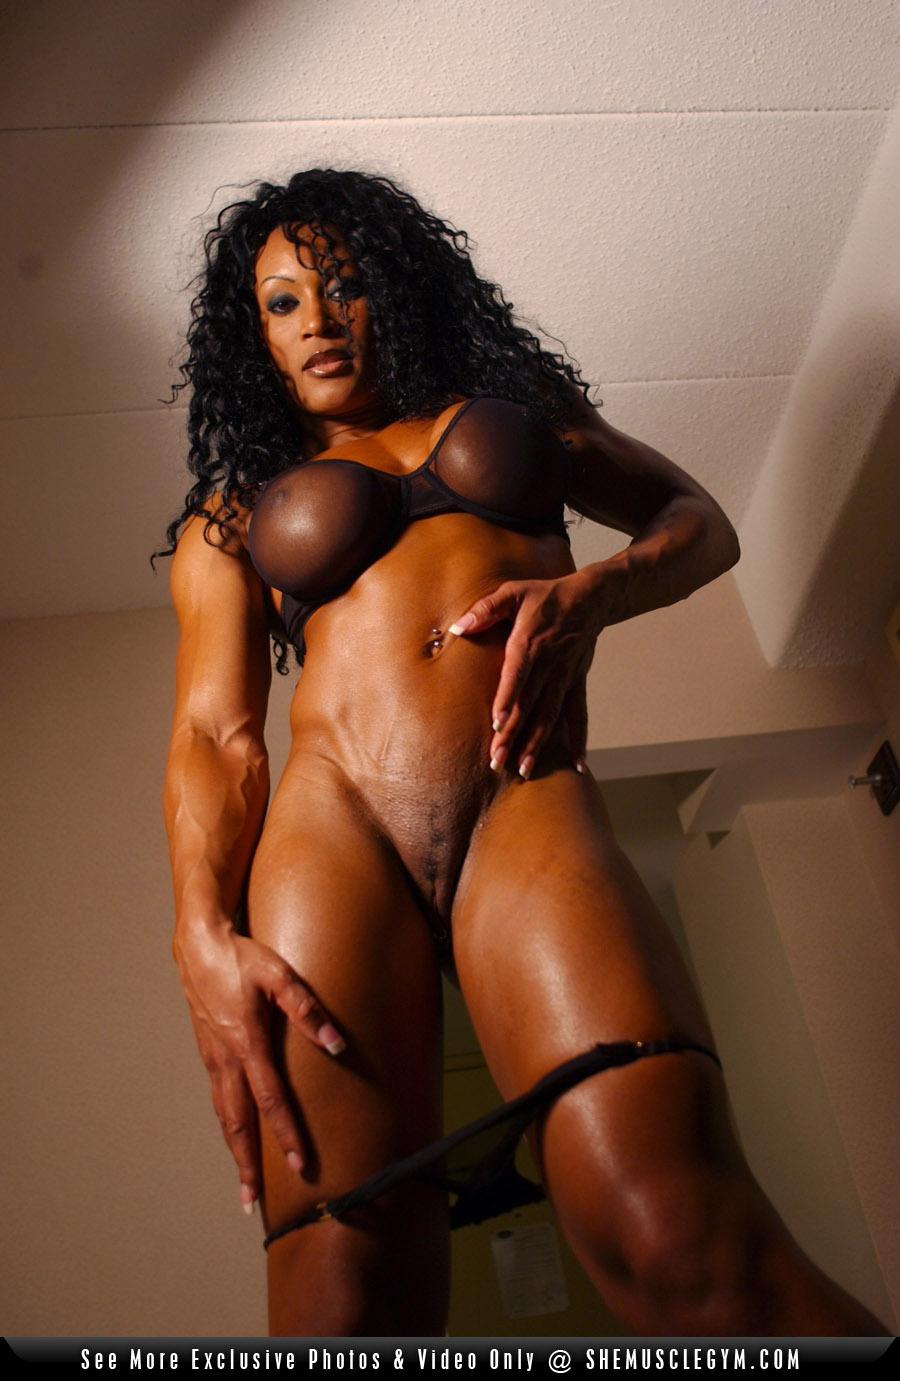 Busty amazon women naked pic